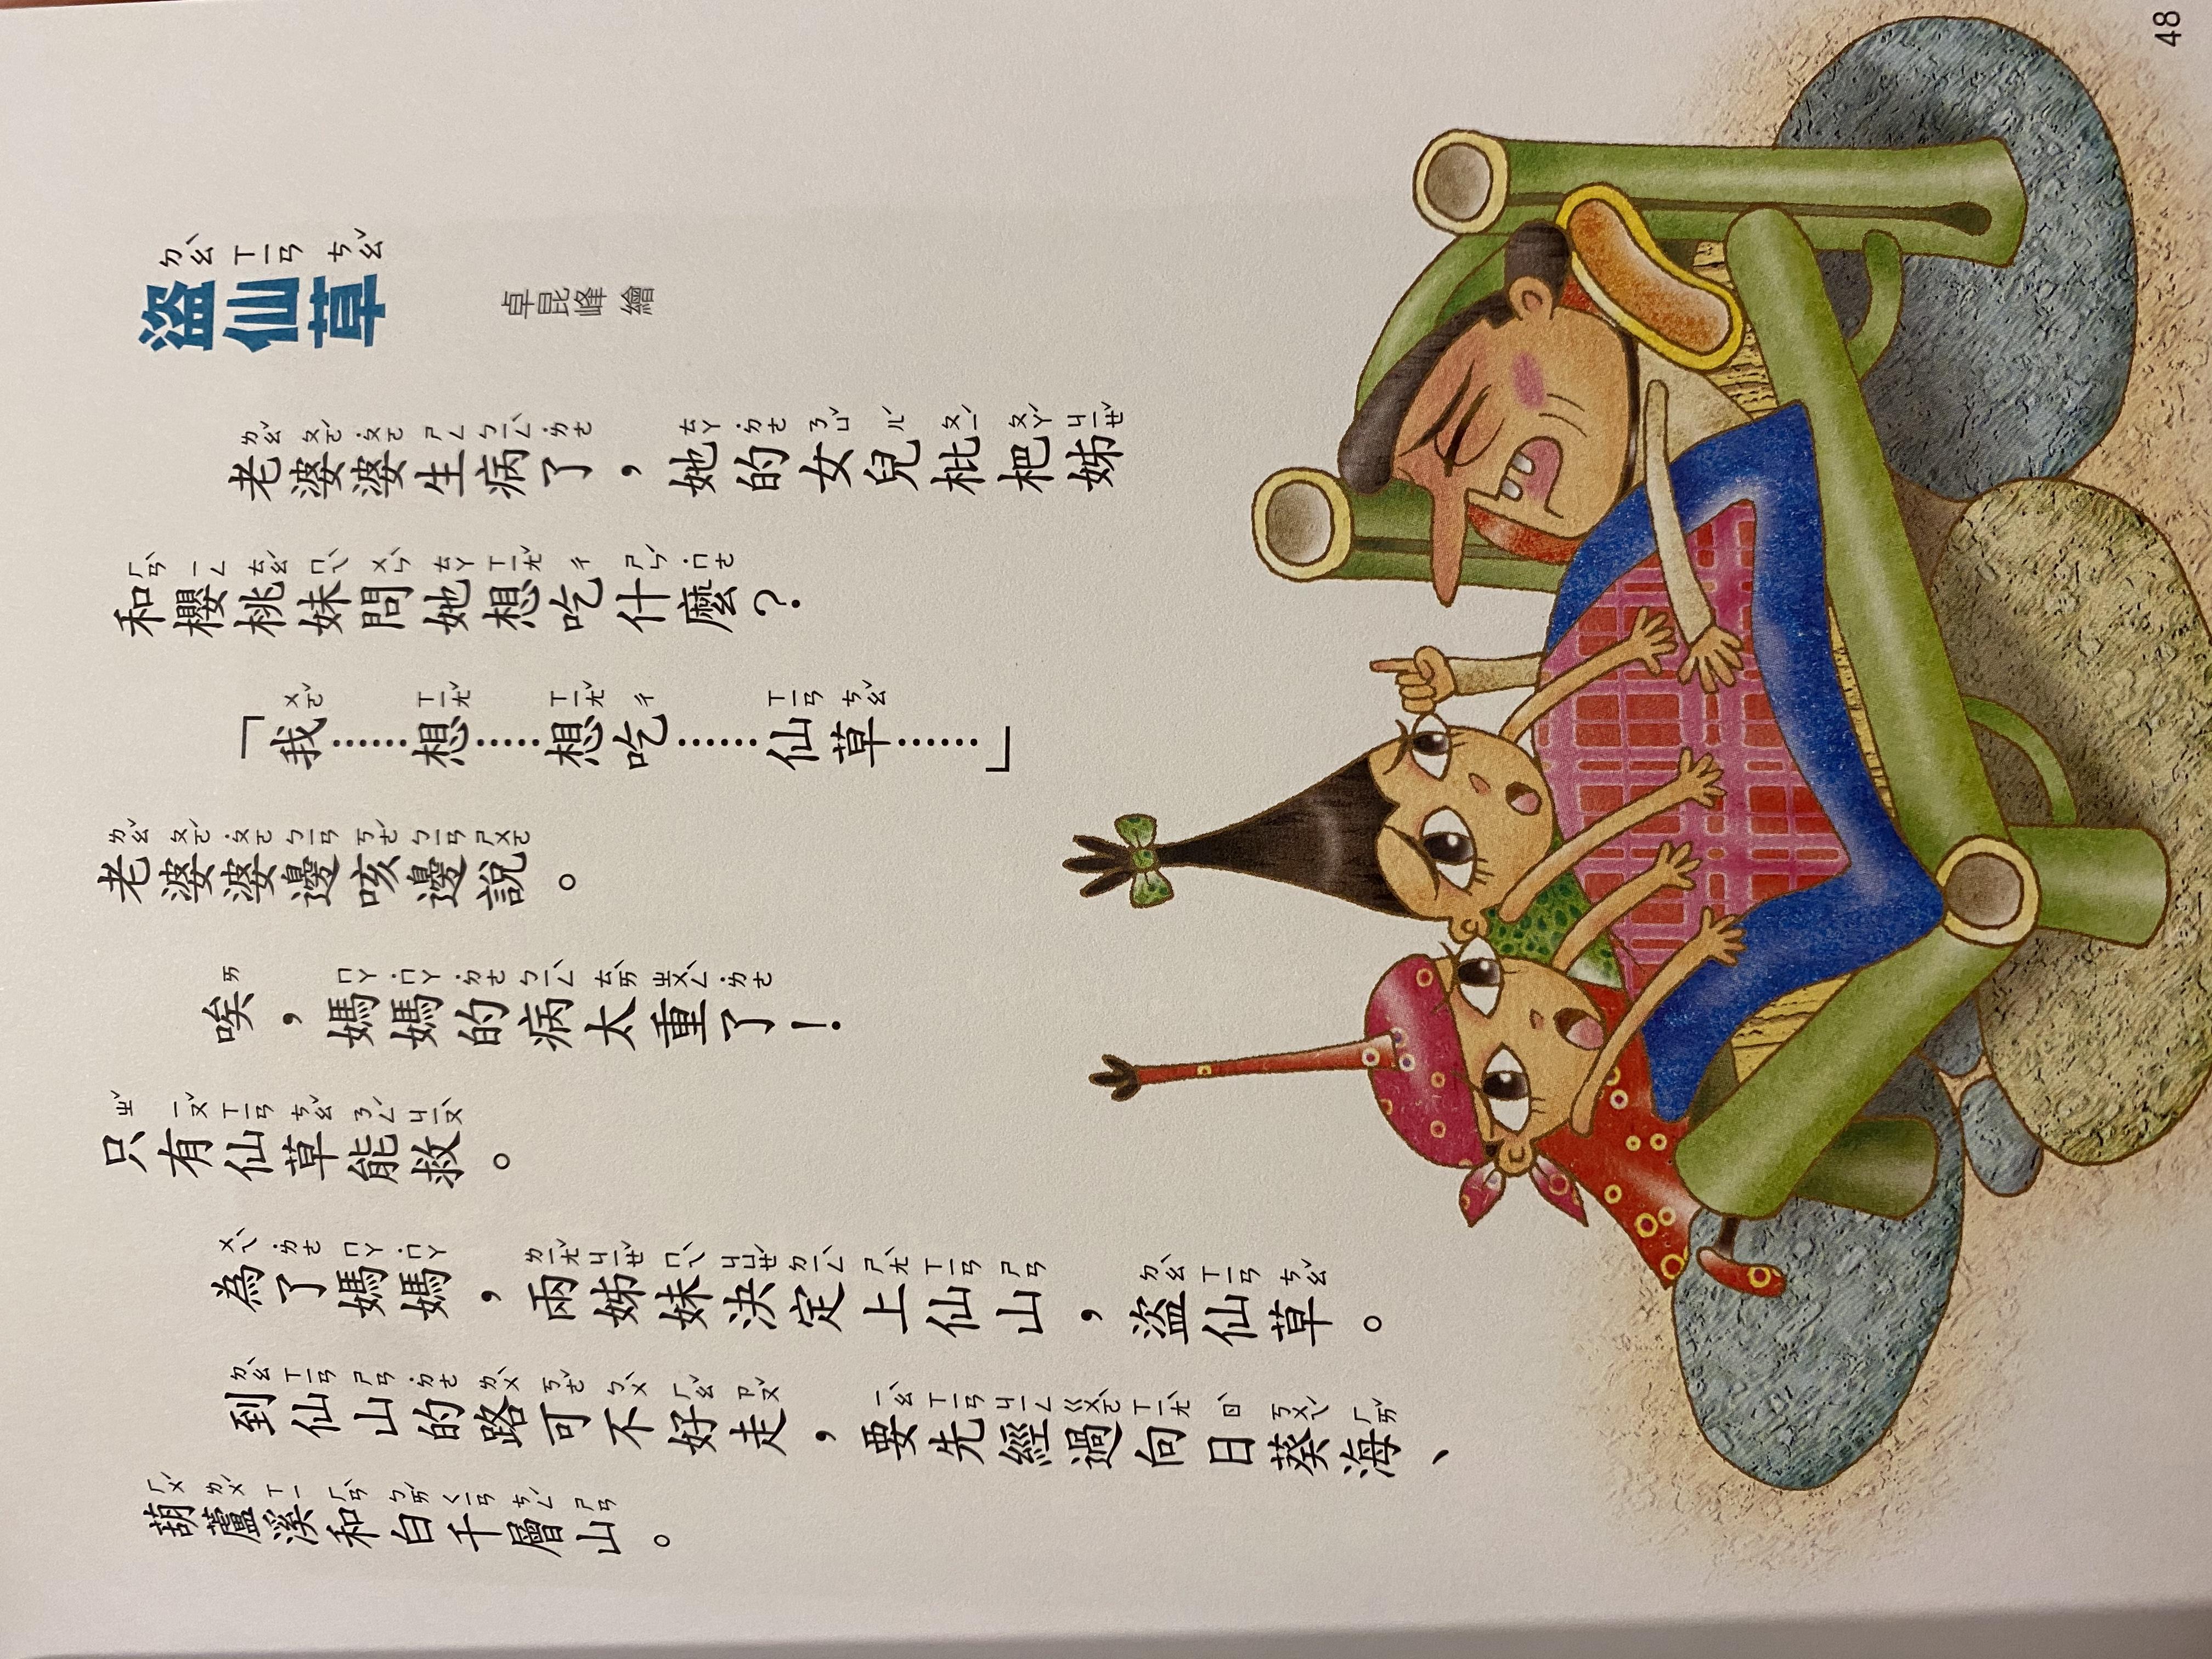 S3-110/ 盜仙草/ 文字植物園/ 福爾摩斯新探案/ 文 林世仁/ 圖 卓昆峰 Mr. B, Pi Pi/ 親子天下